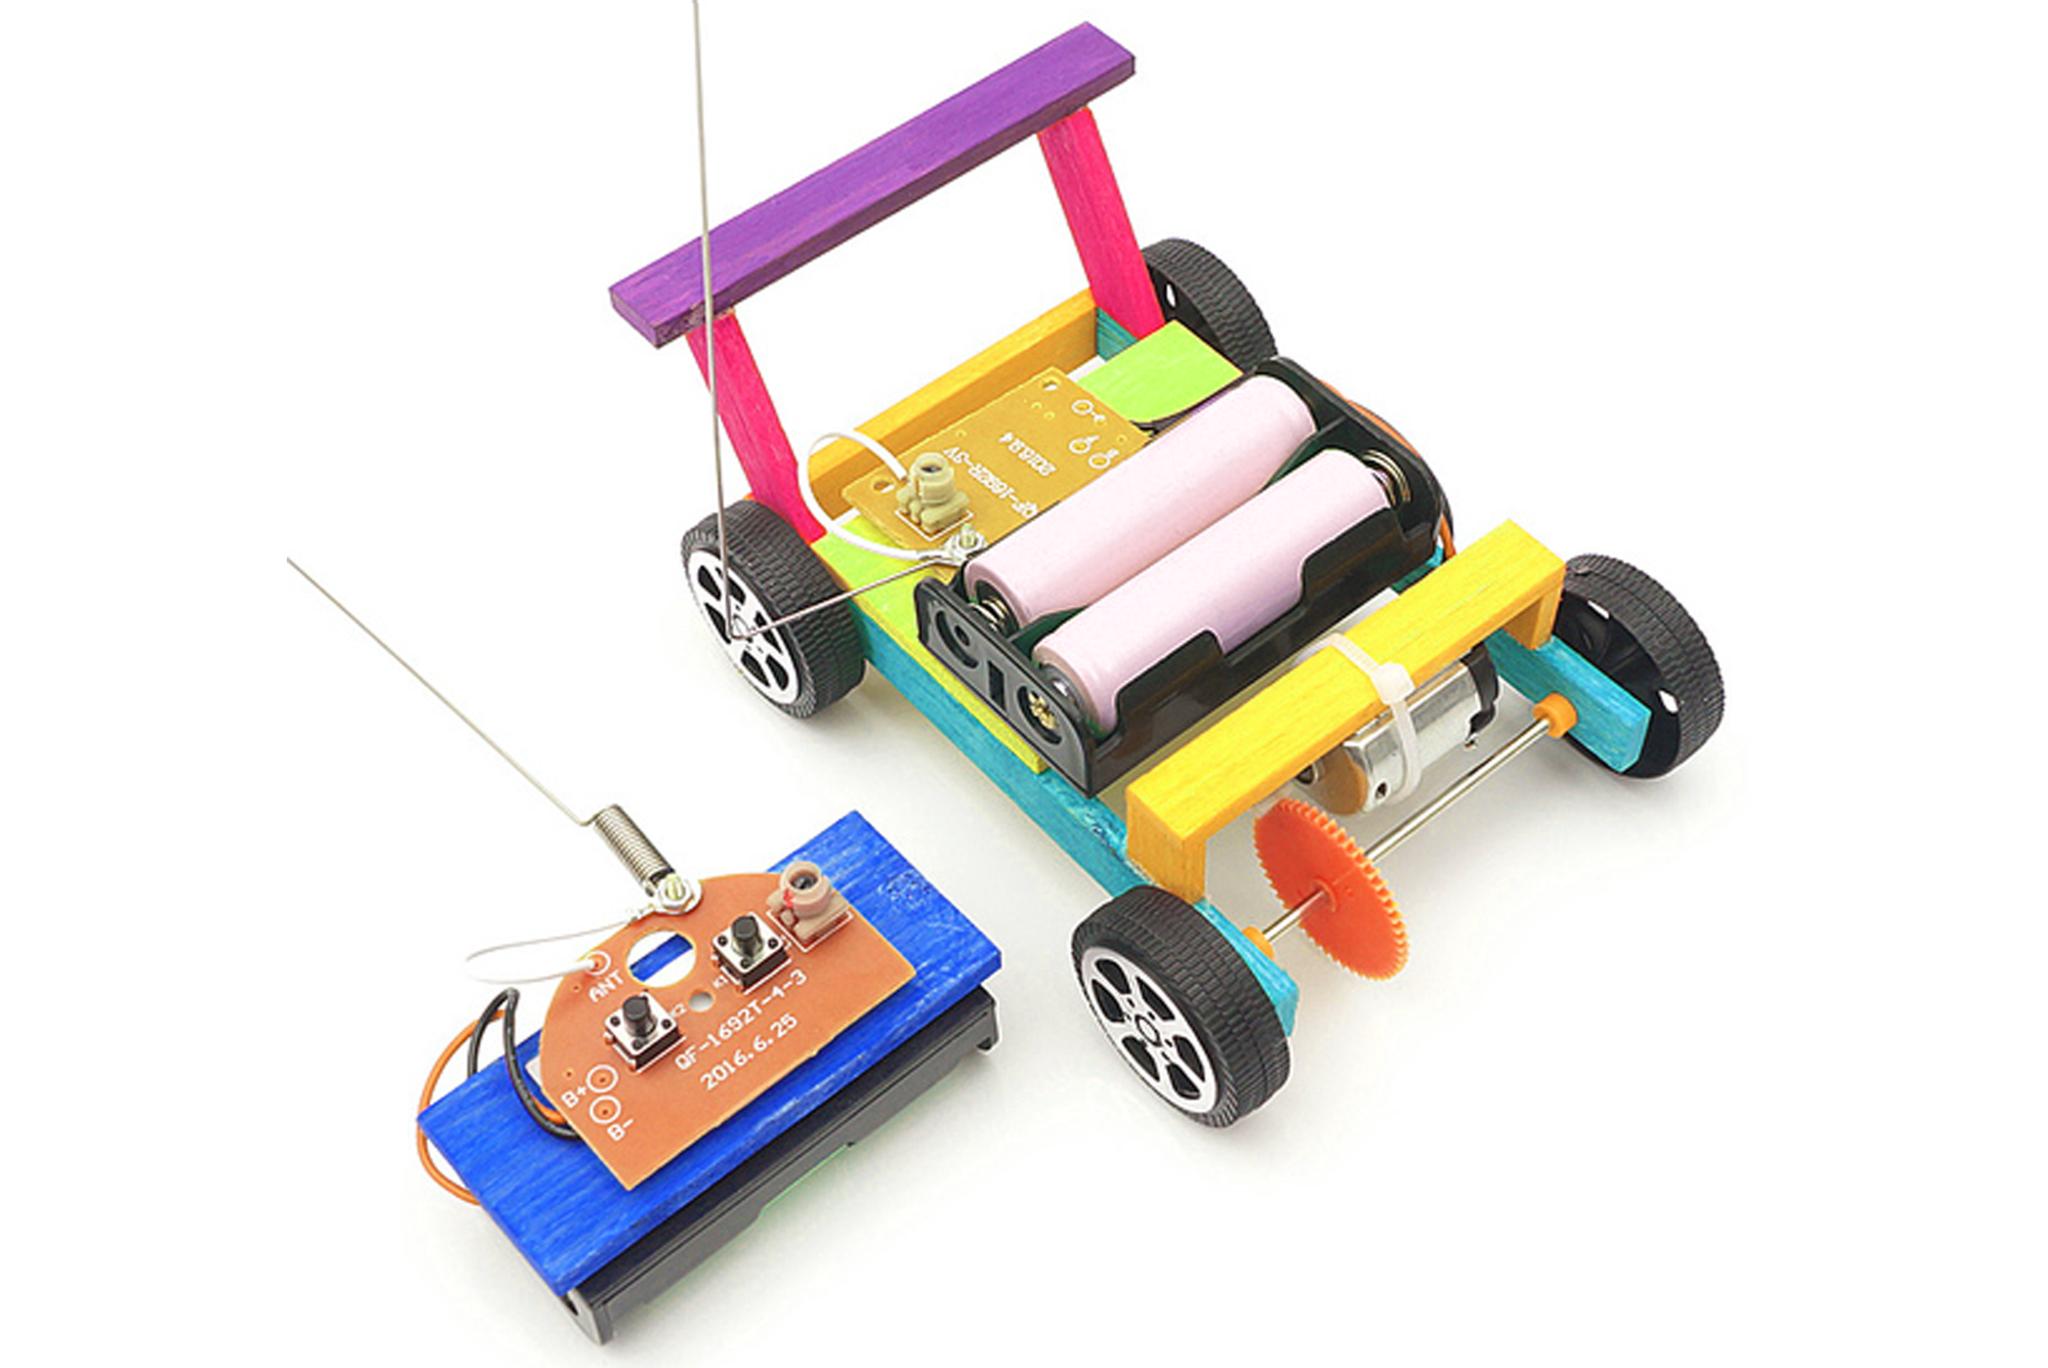 Awe Inspiring Circuit Board Race Car Remote Controlled Do It Wiring Cloud Waroletkolfr09Org